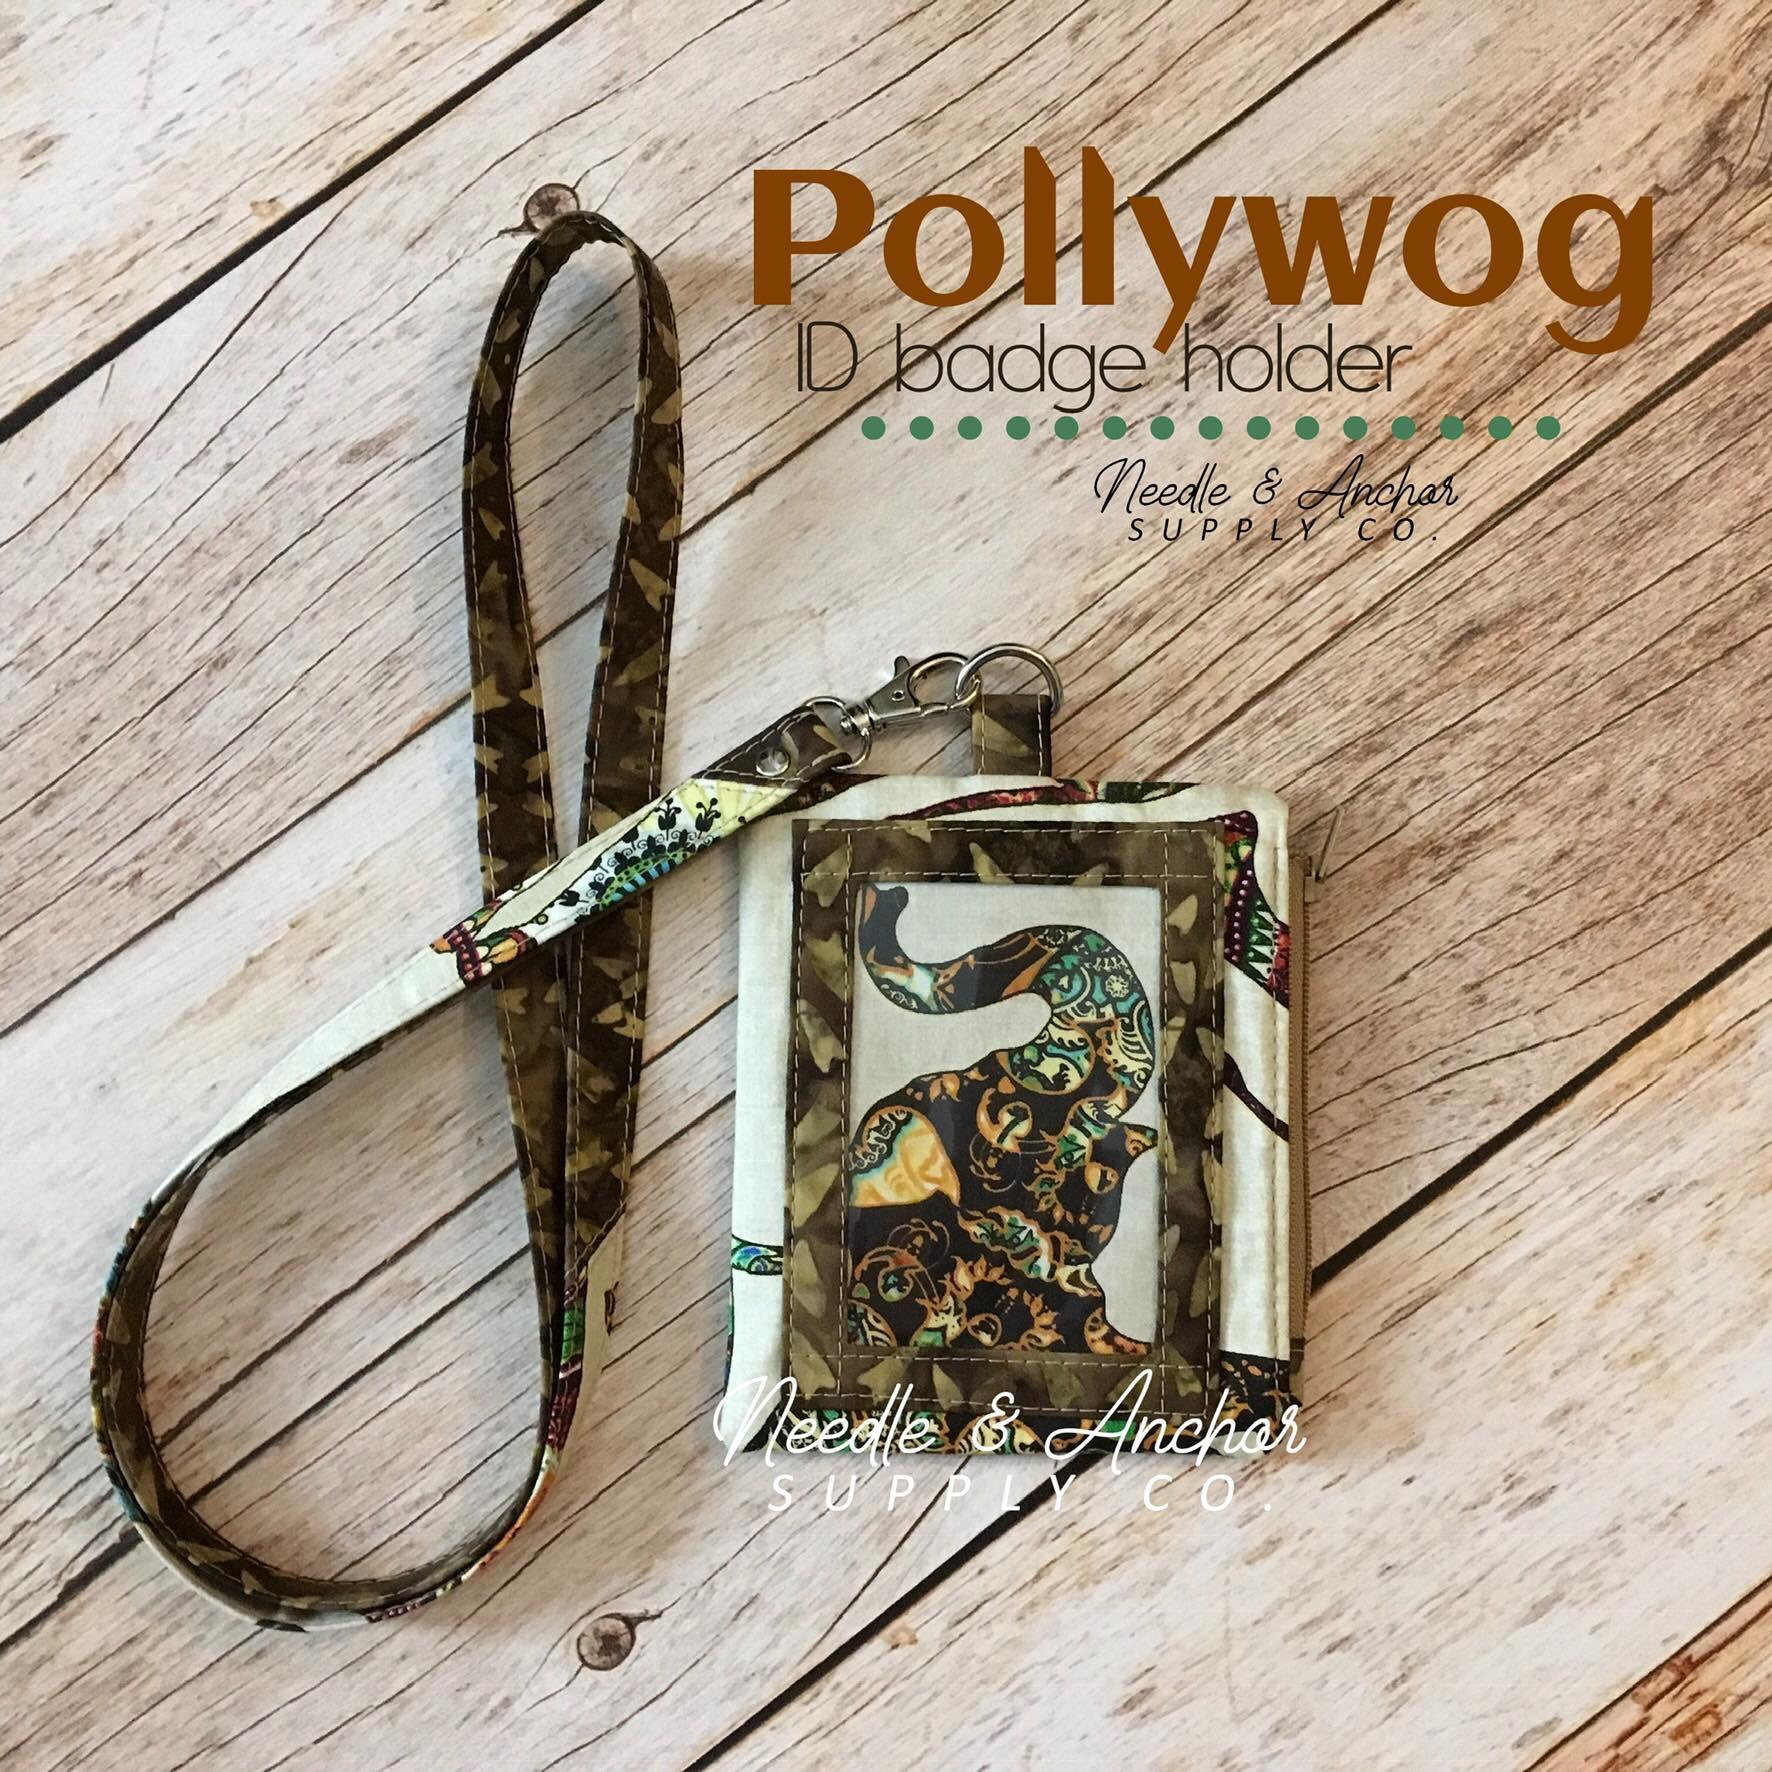 PollywogLOGO2.jpg